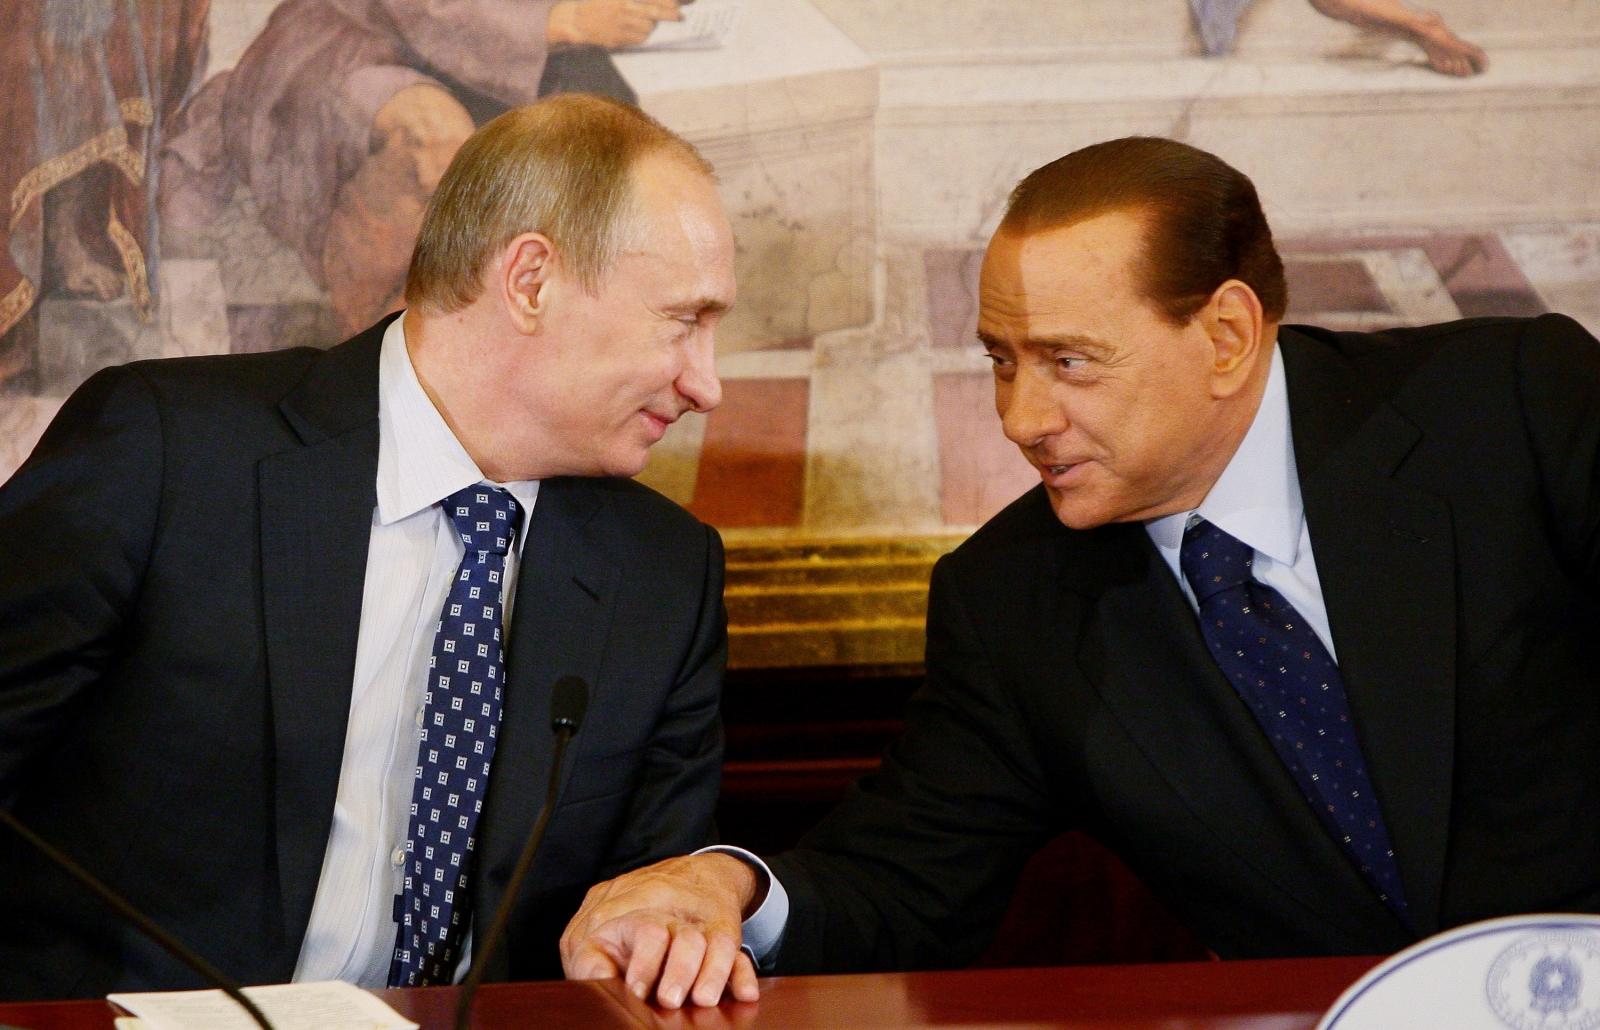 Putin and Berlusconi